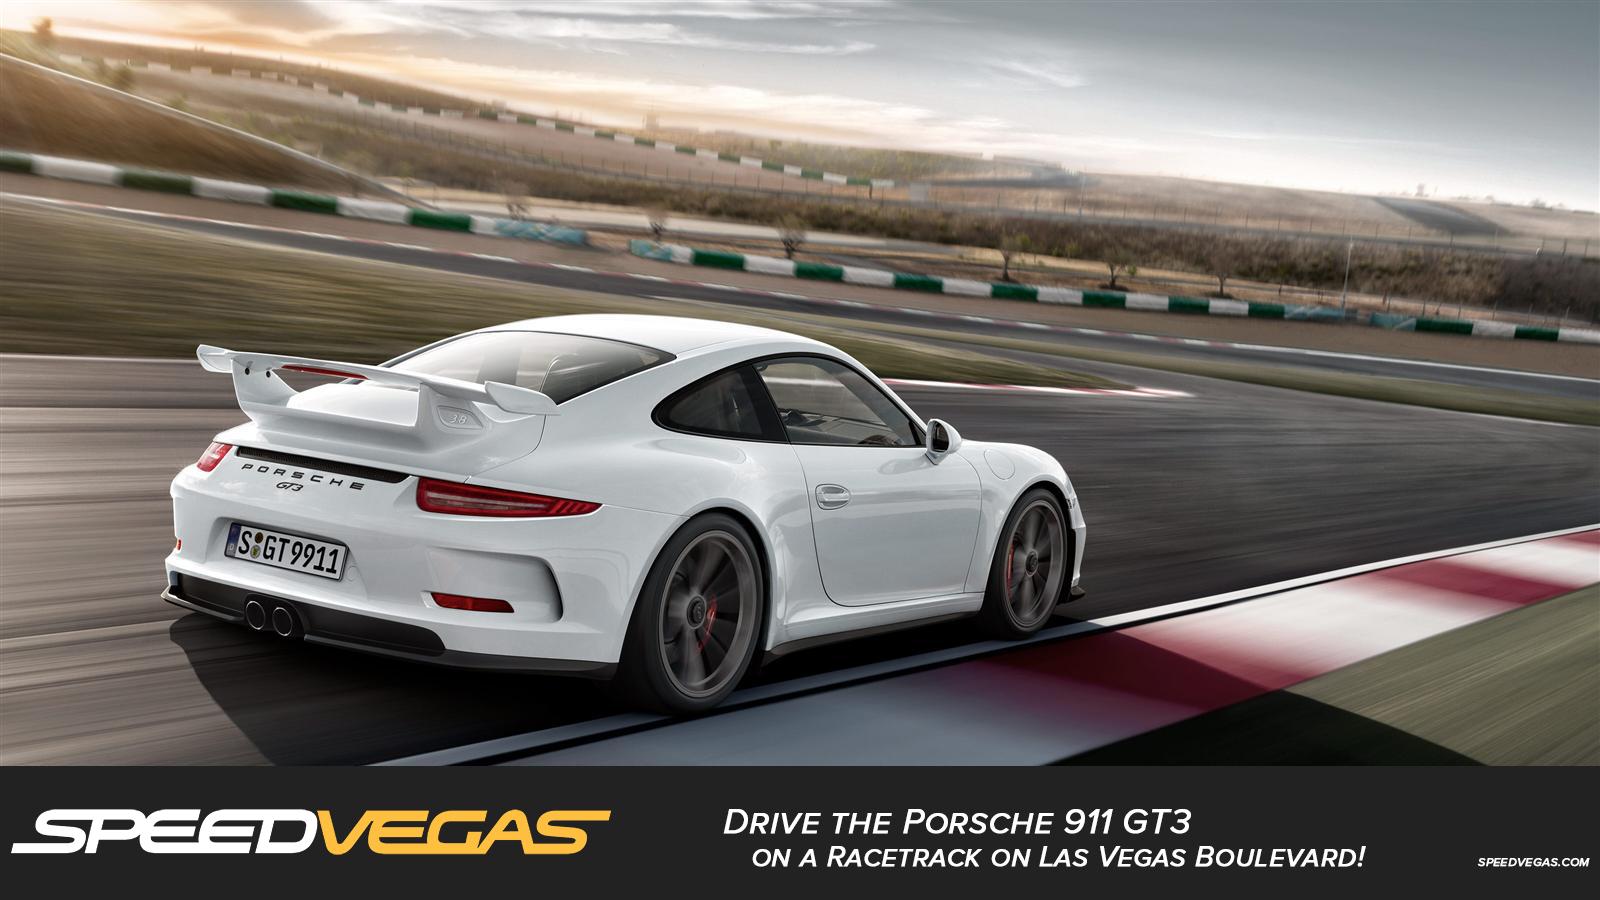 Exotic Car Racing Las Vegas >> Drive a Porsche 911 GT3 in Las Vegas: Porsche Driving Experience | SPEEDVEGAS